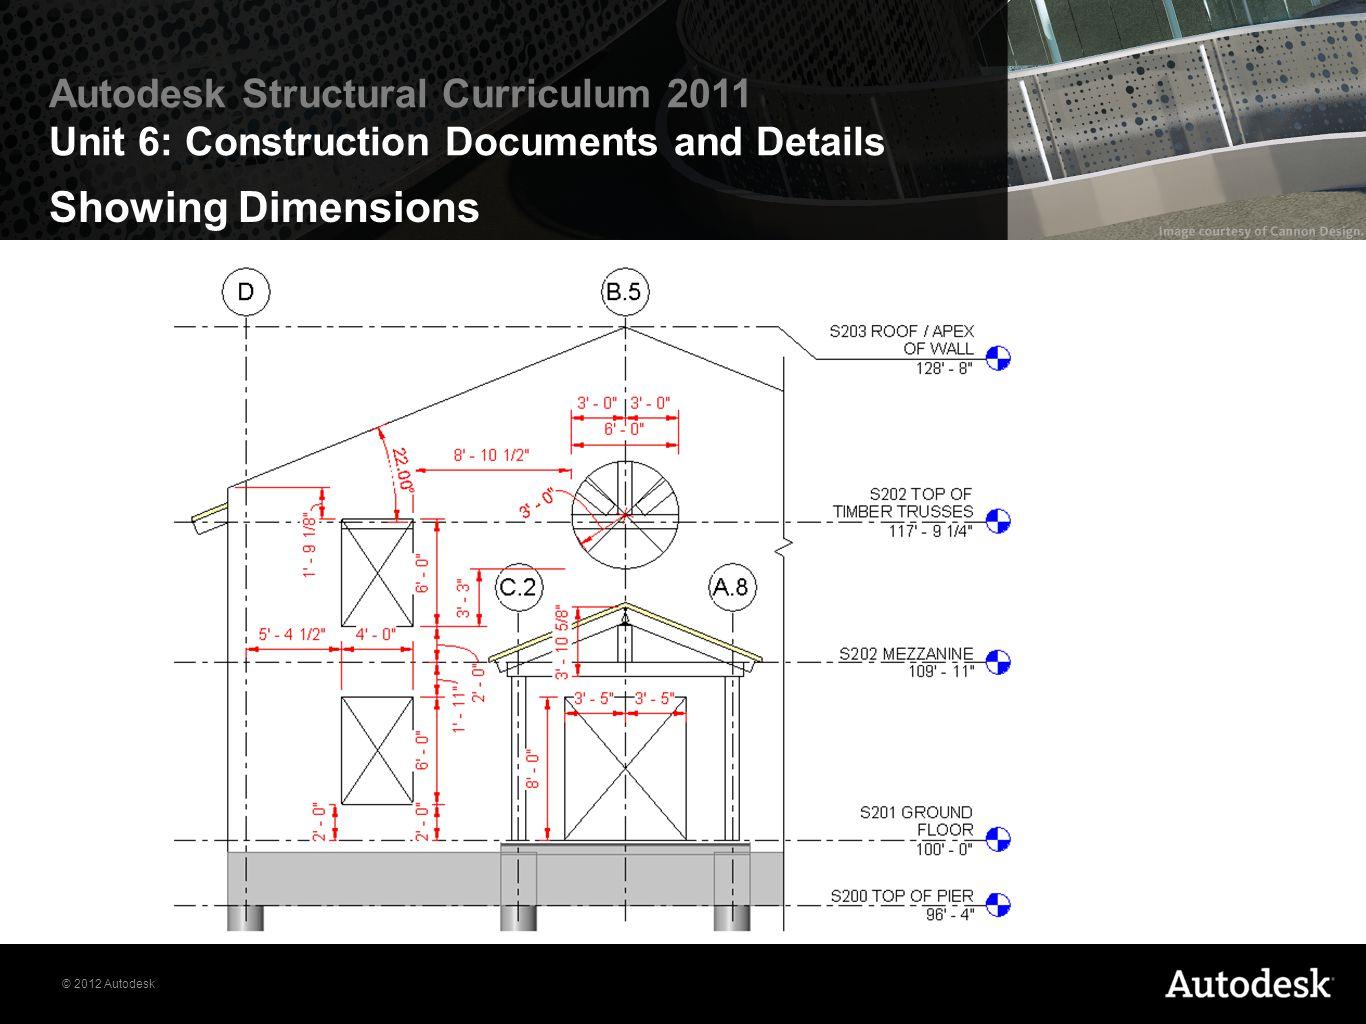 © 2012 Autodesk Autodesk Structural Curriculum 2011 Unit 6: Construction Documents and Details Showing Dimensions